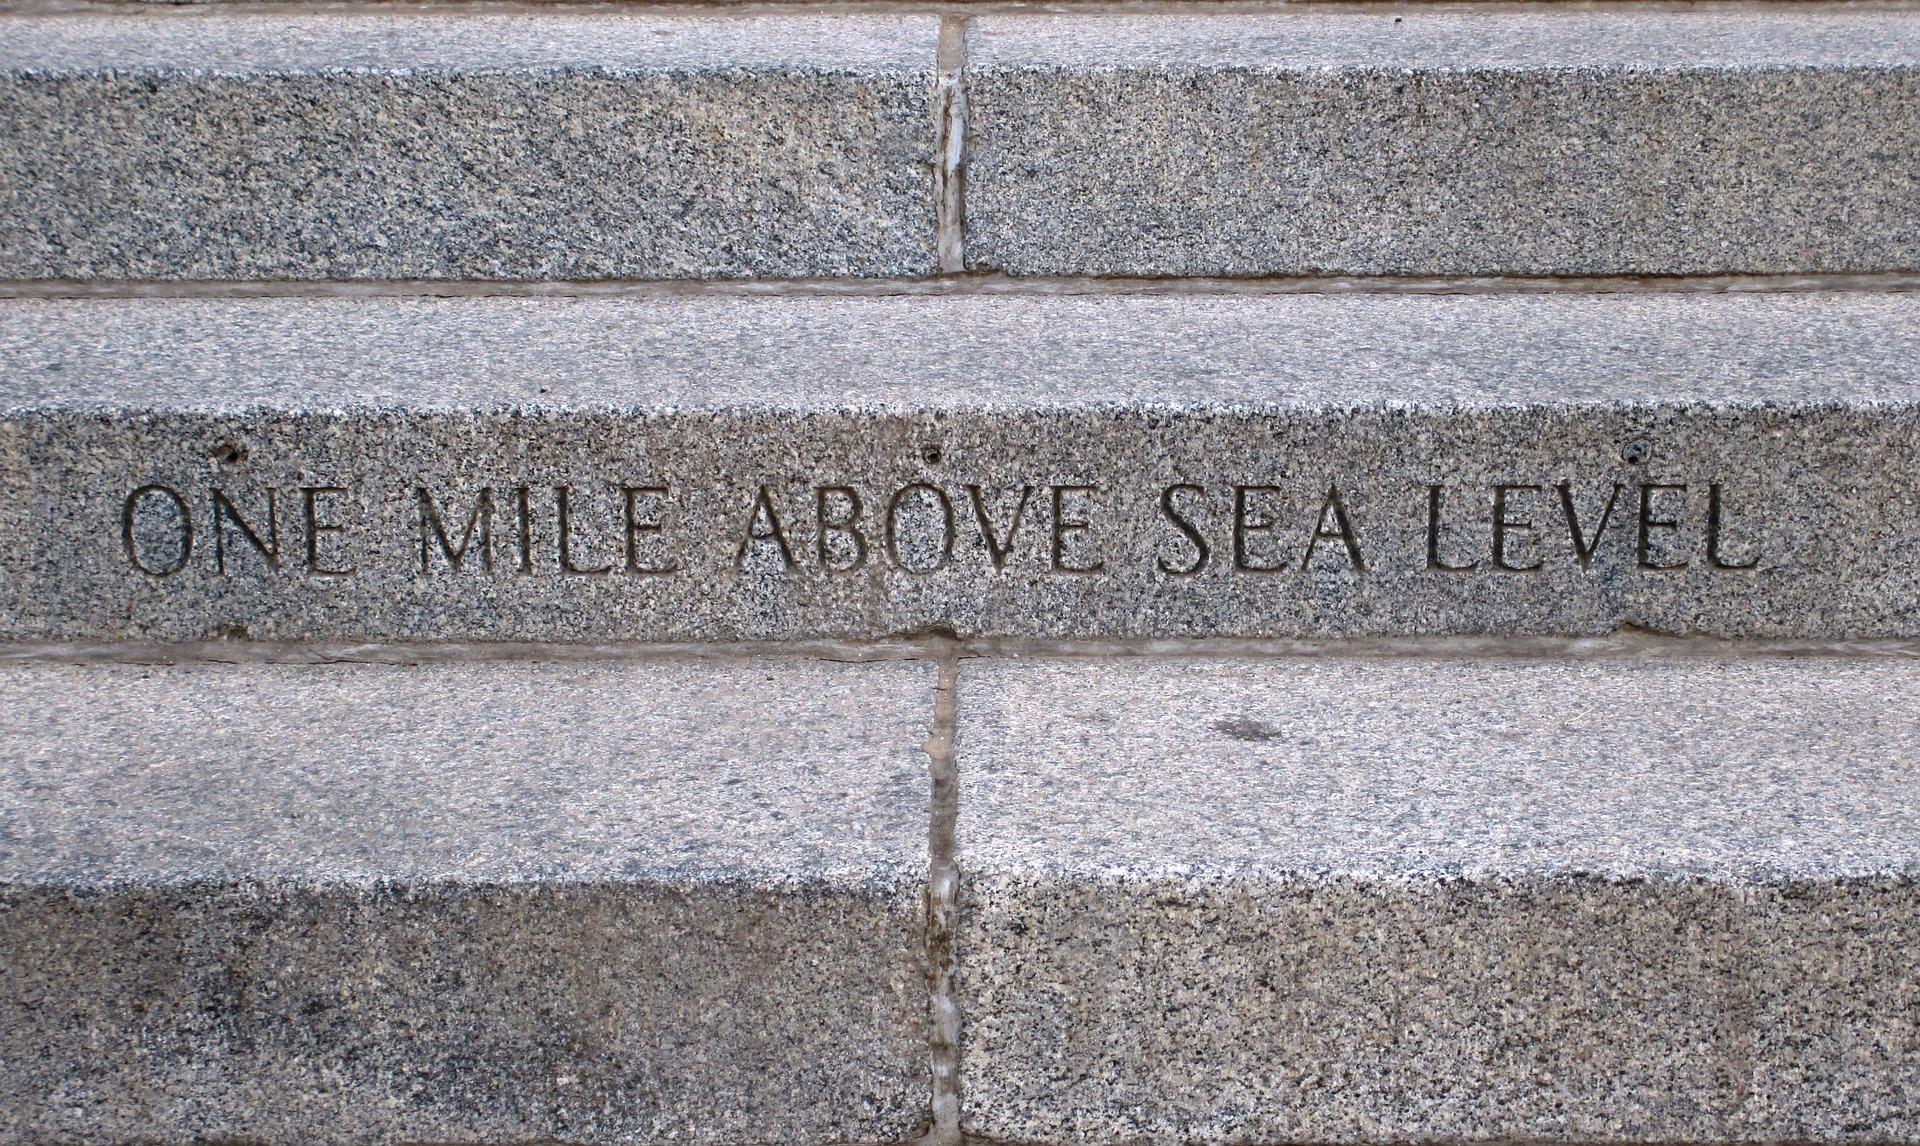 Denver - One Mile Above Sea Level Engraving